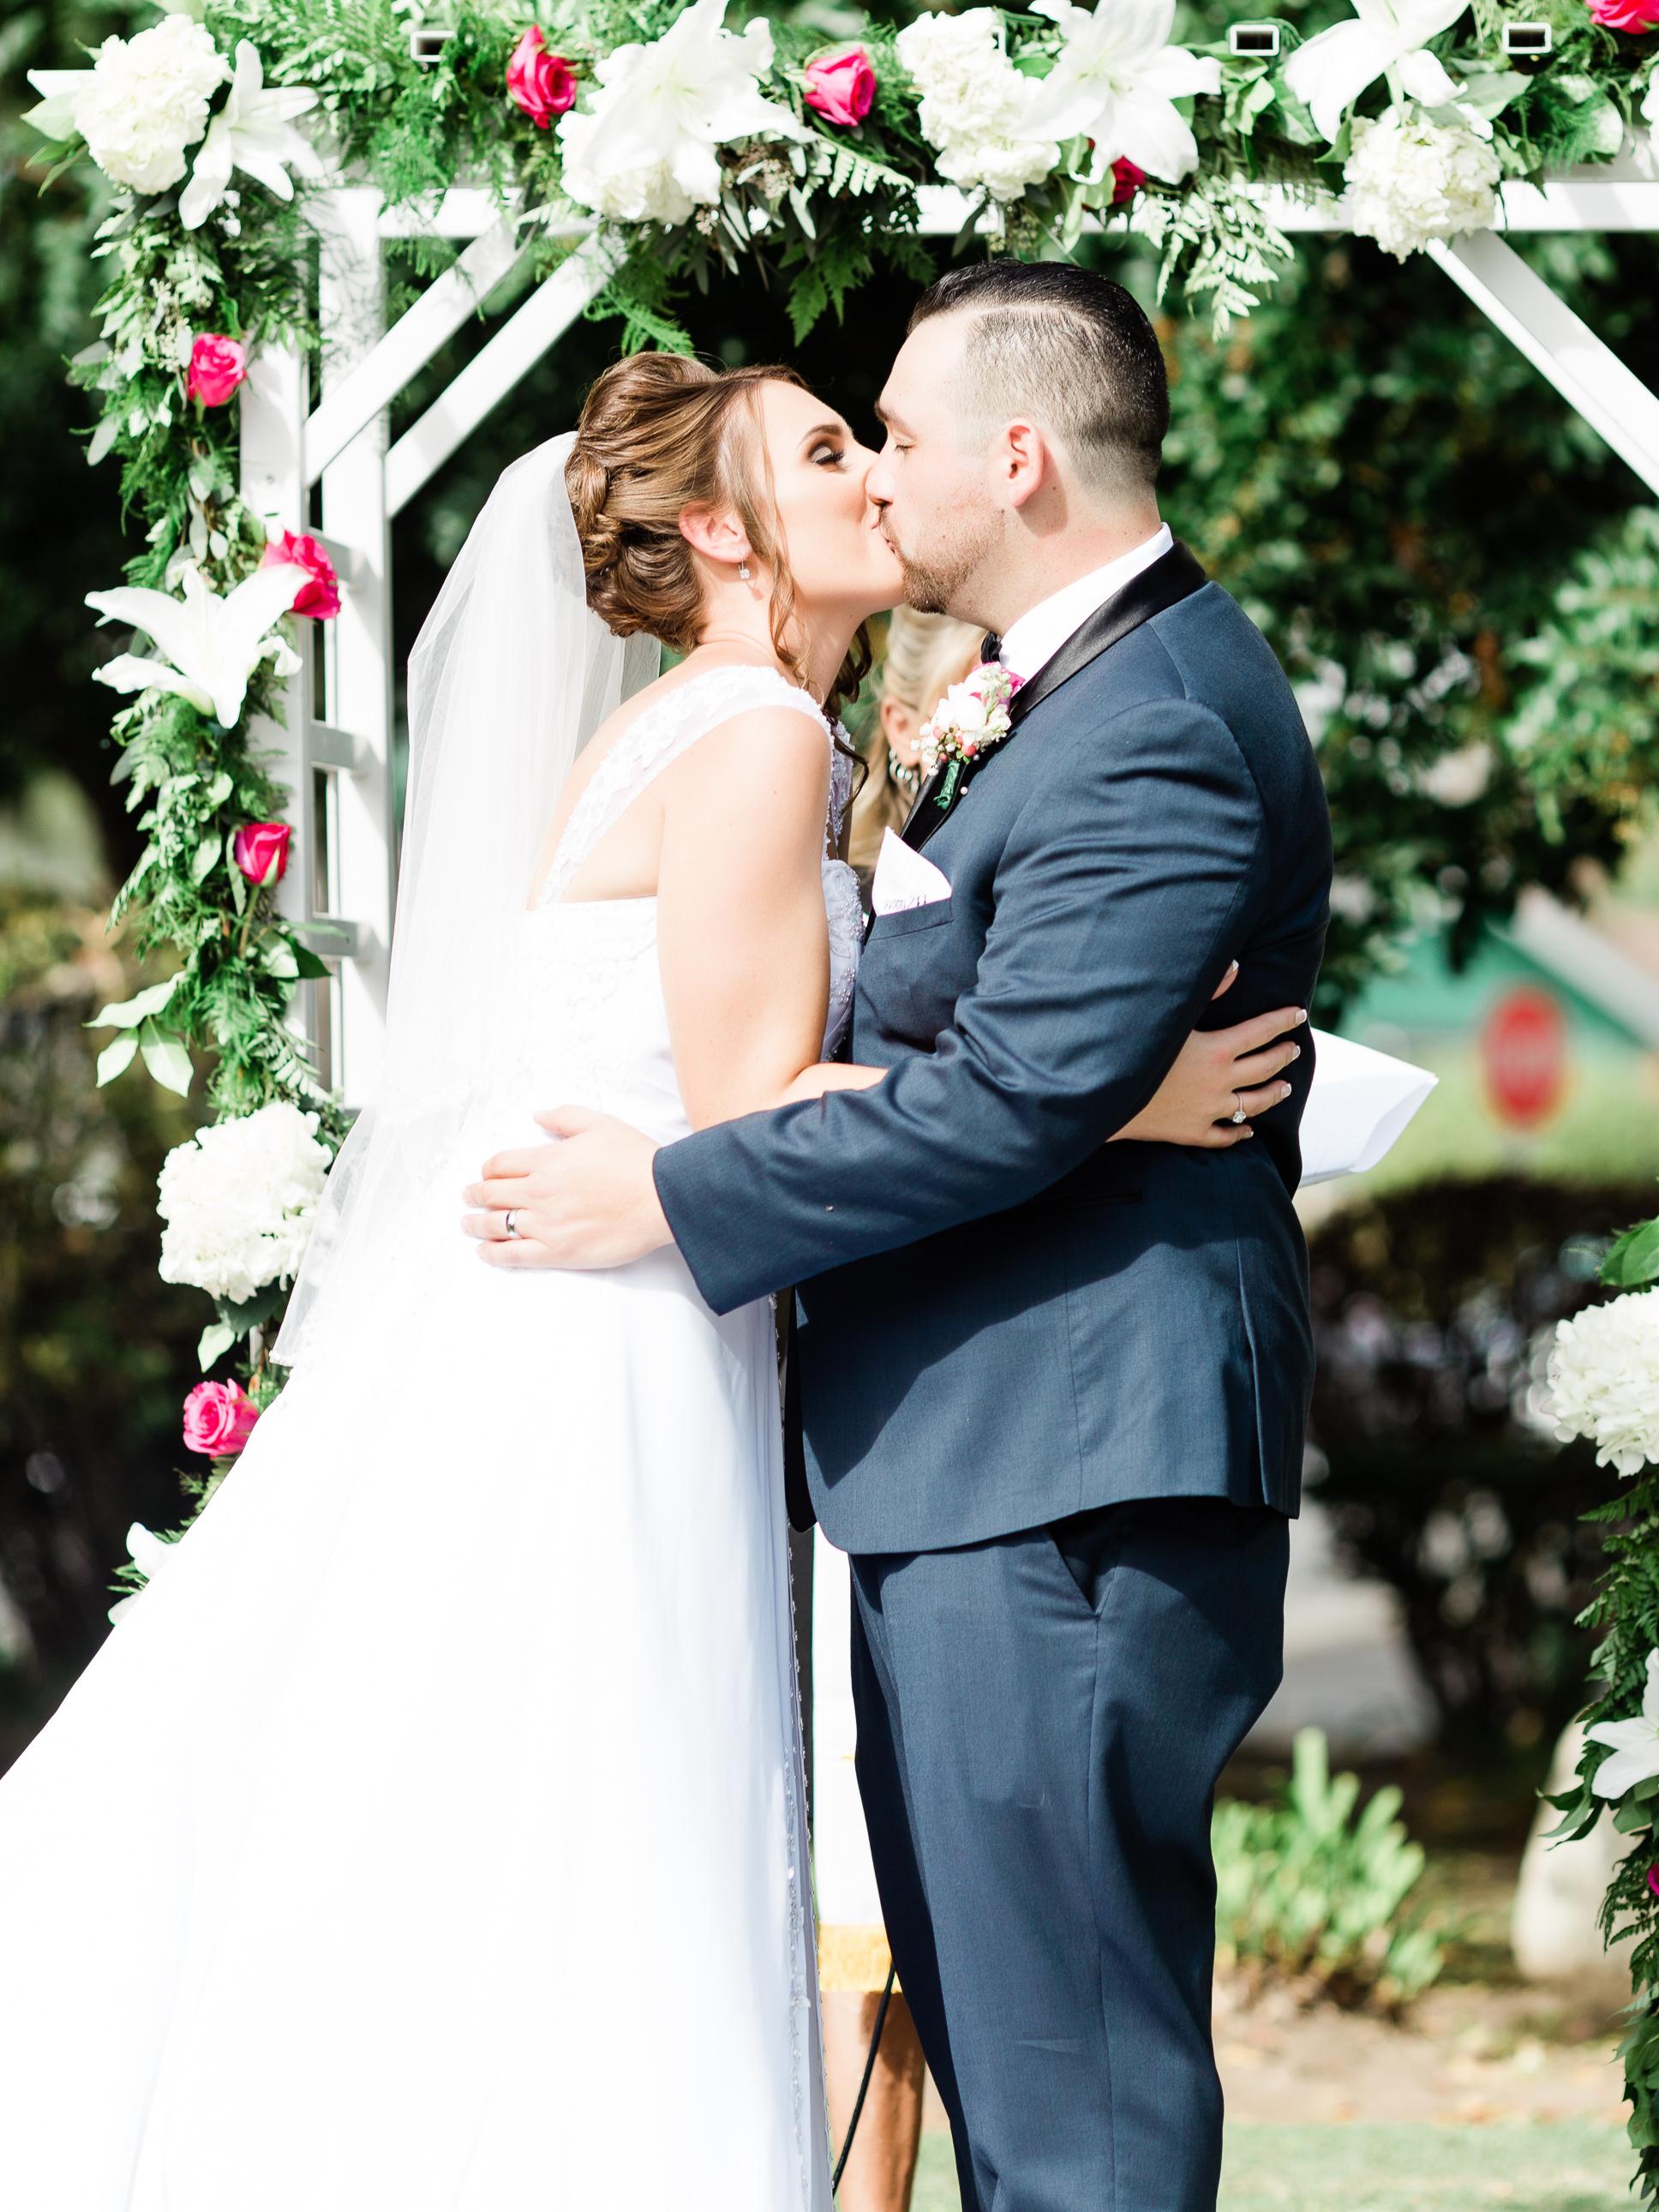 11_12_16_Robin_Mike_Pena_Wedding_1629-Edit.jpg